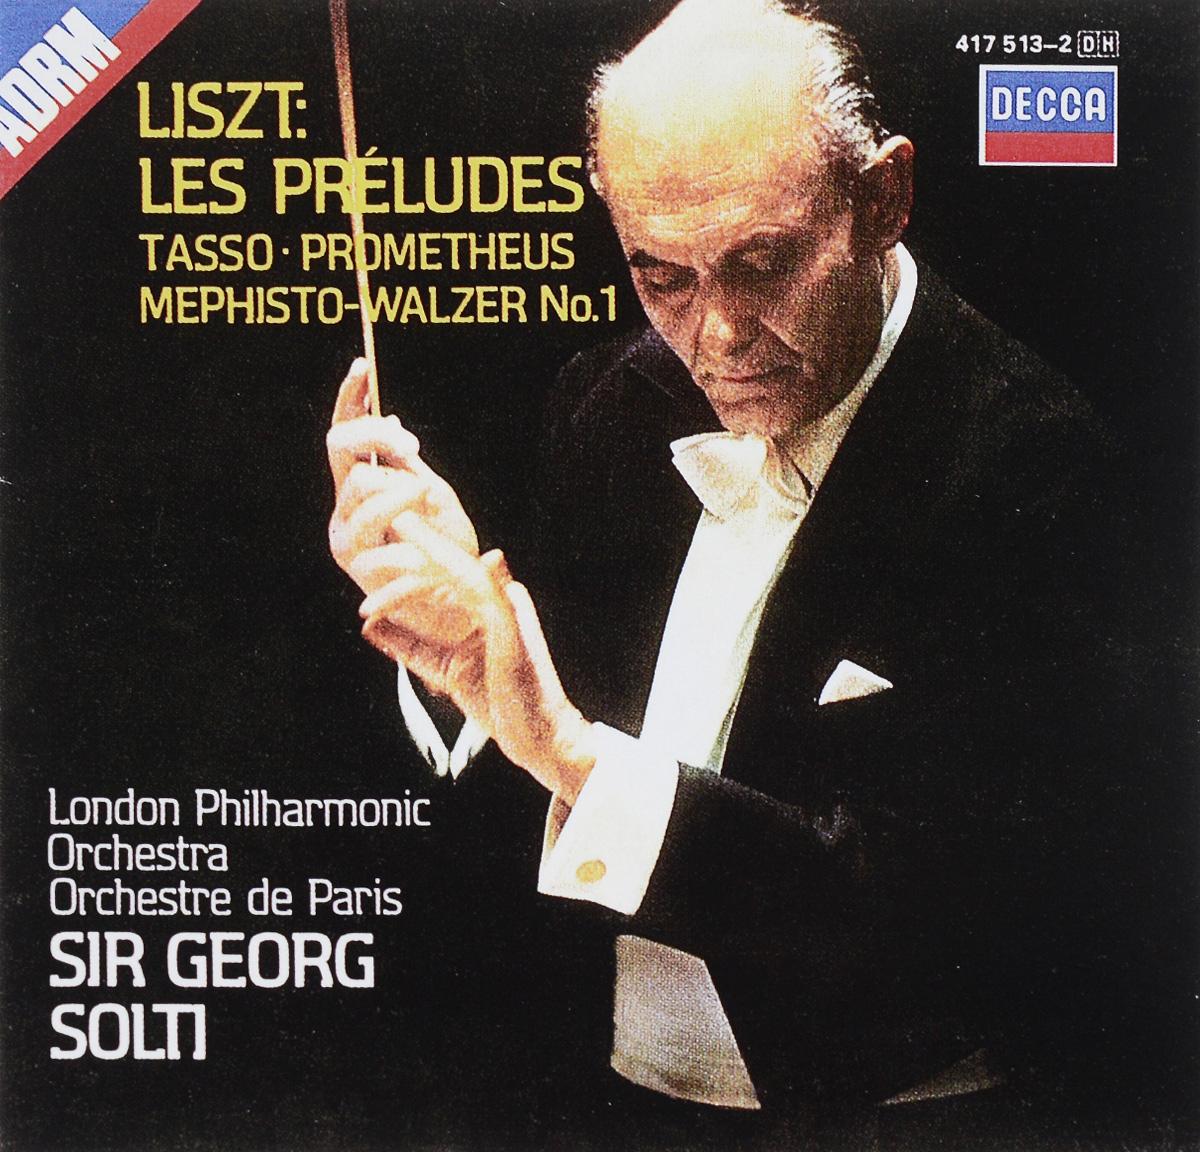 Георг Шолти,London Philharmonic Orchestra,Orchestre De Paris Sir Georg Solti. Liszt. Les Preludes / Tasso / Prometheus / Mephisto-Waltzer No.1 цена в Москве и Питере